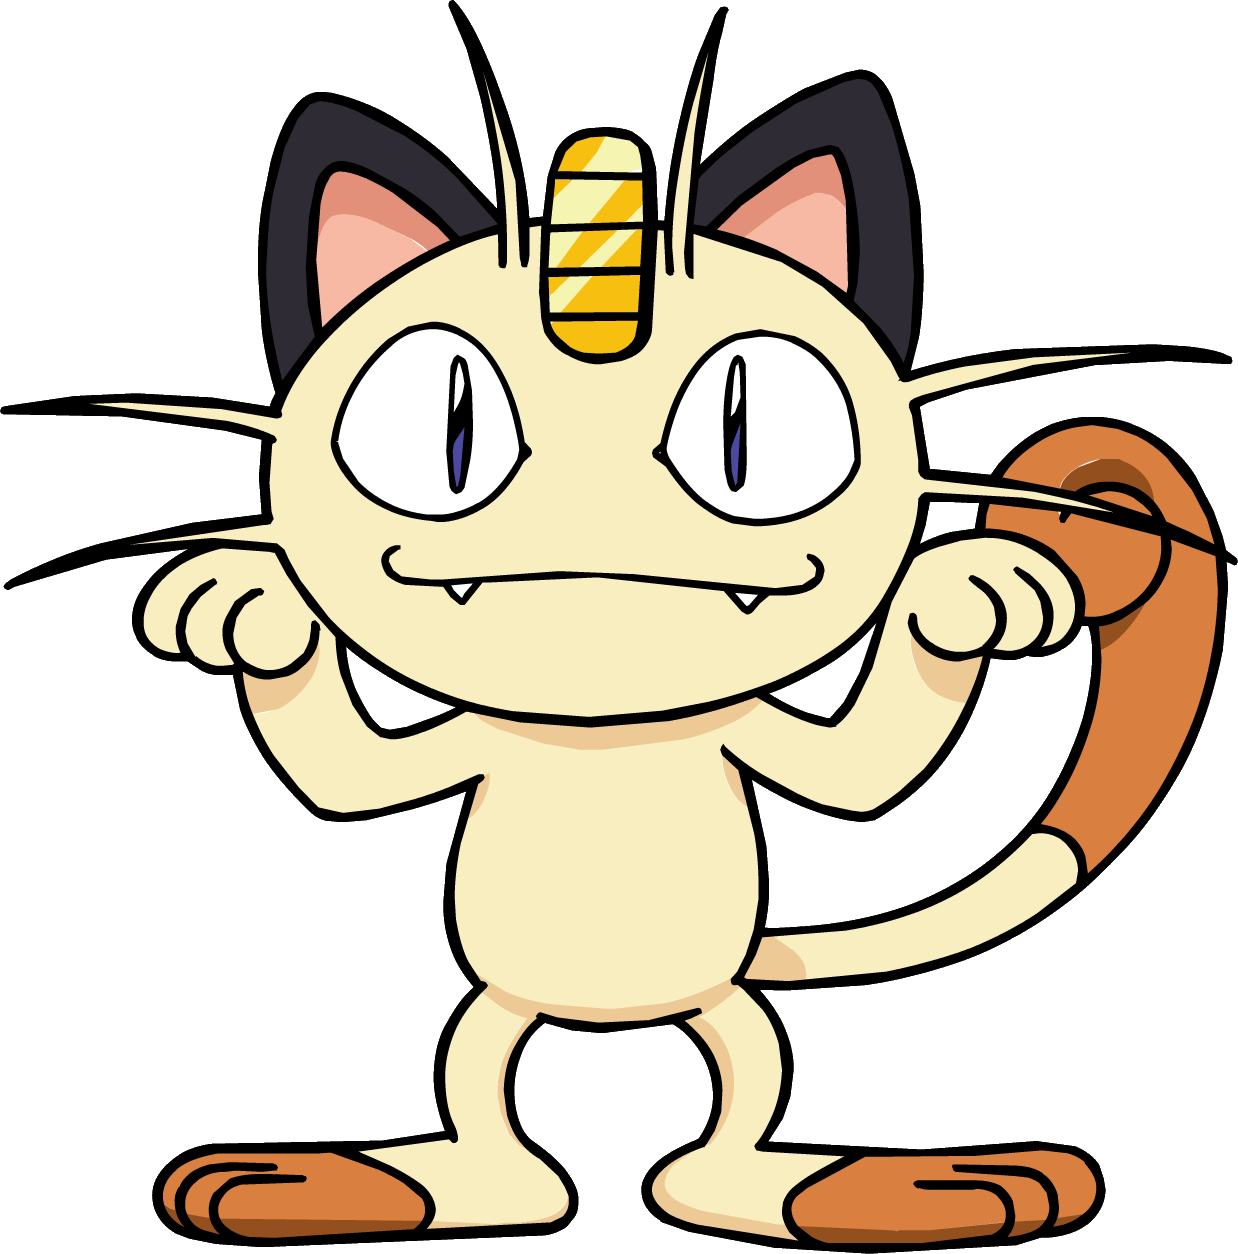 Clipart cat electrocuted vector transparent library Meowth | Death Battle Fanon Wiki | FANDOM powered by Wikia vector transparent library